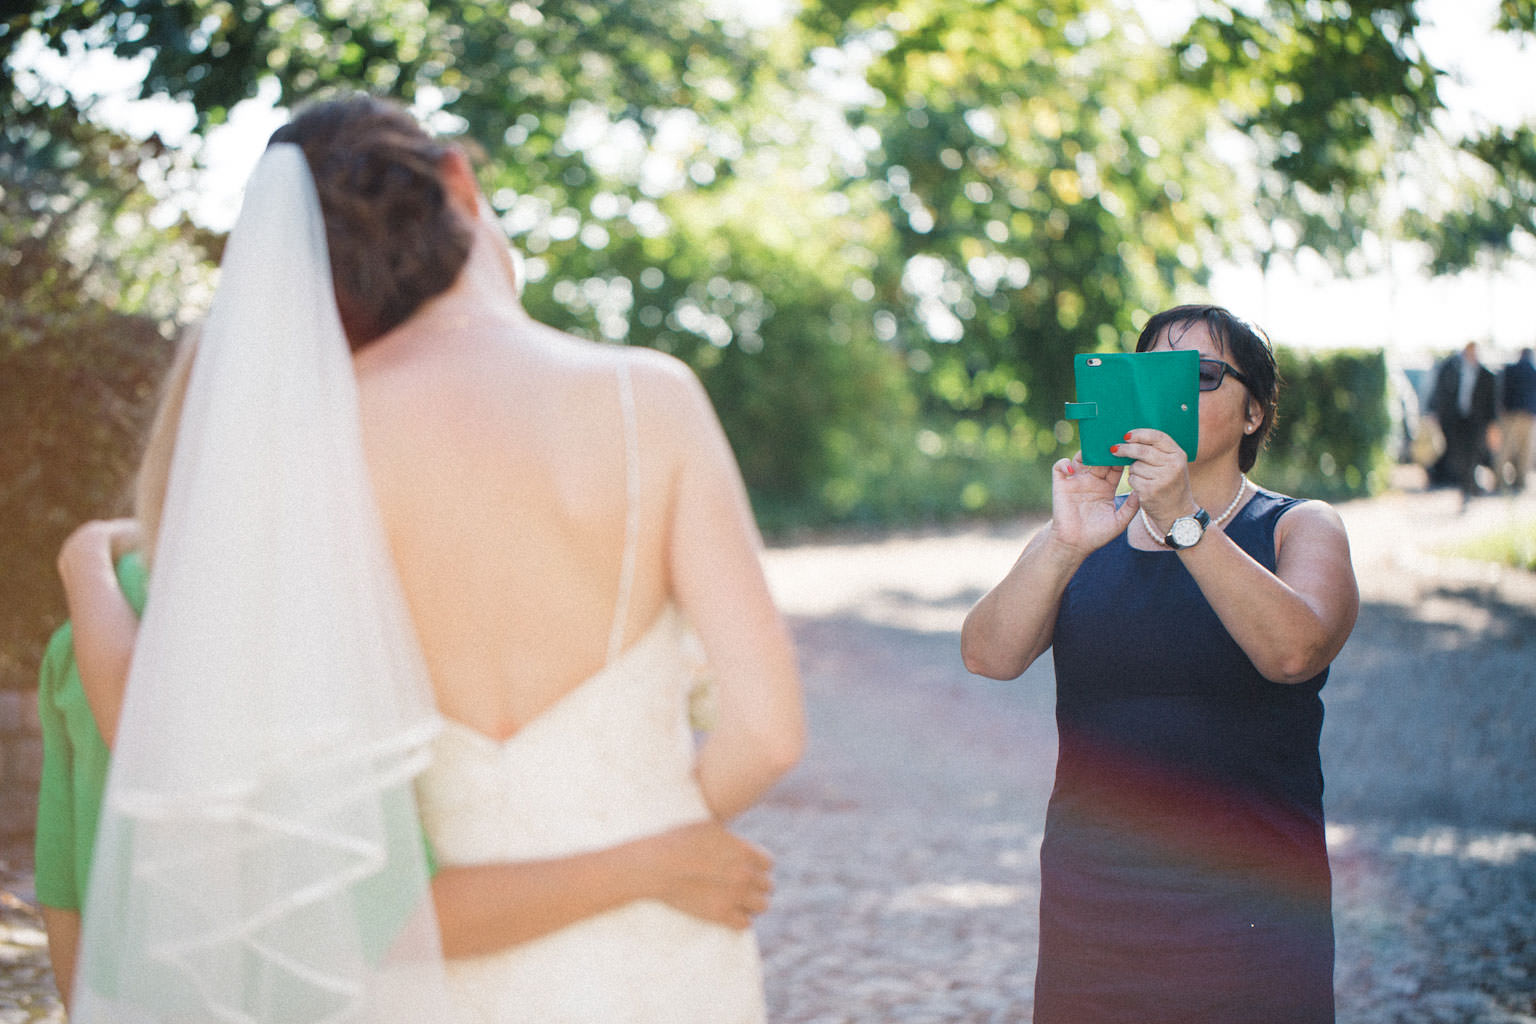 Bröllop på Kafferosteriet, Österlen. Foto: Tove Lundquist, verksam bröllopsfotograf i Skåne.